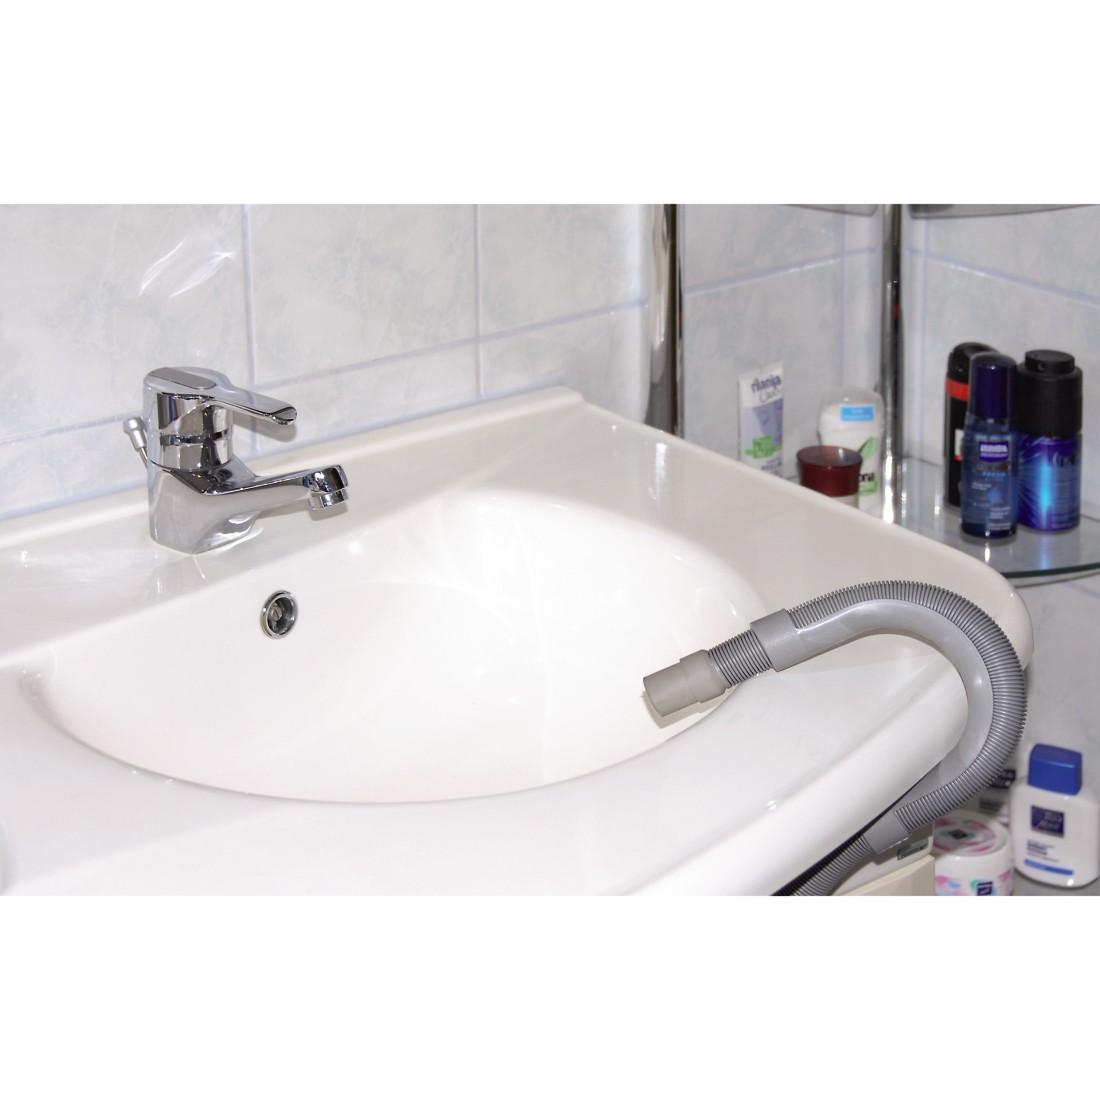 00110958 xavax tuyau d 39 vacuation d 39 eau pour. Black Bedroom Furniture Sets. Home Design Ideas